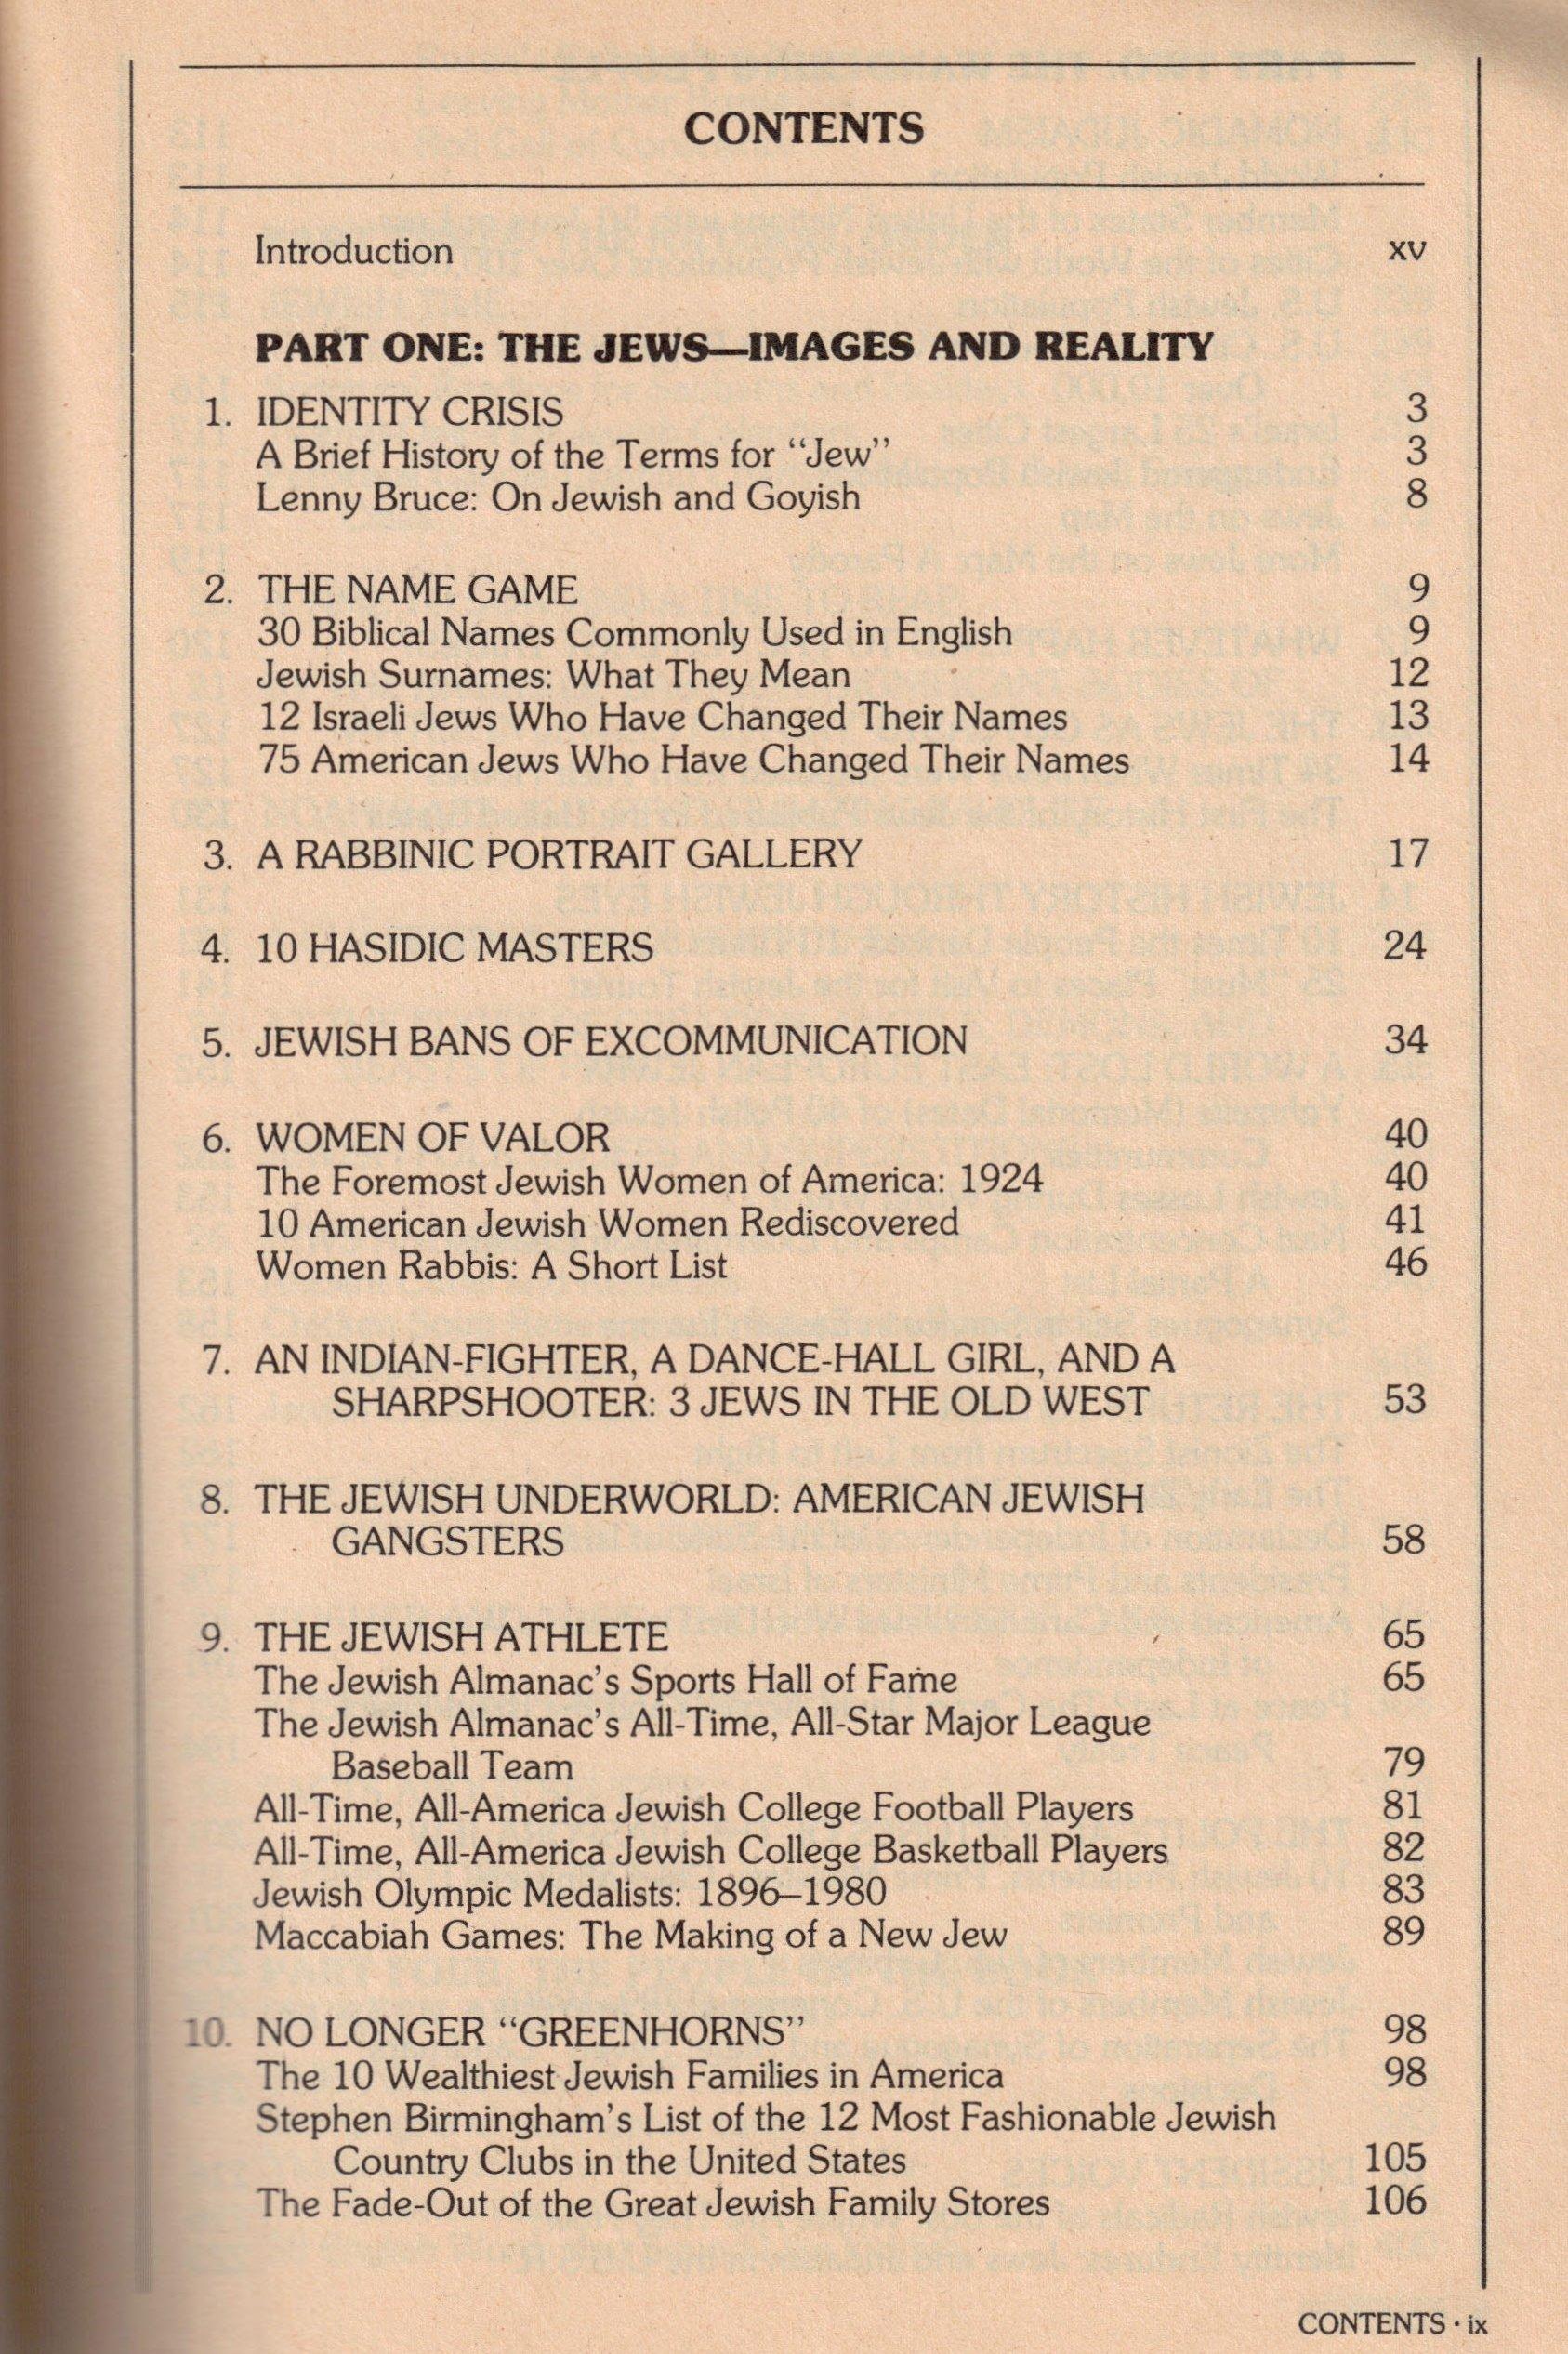 Jewish Almanac: Richard Siegel, Carl Rheins: 9780553012651